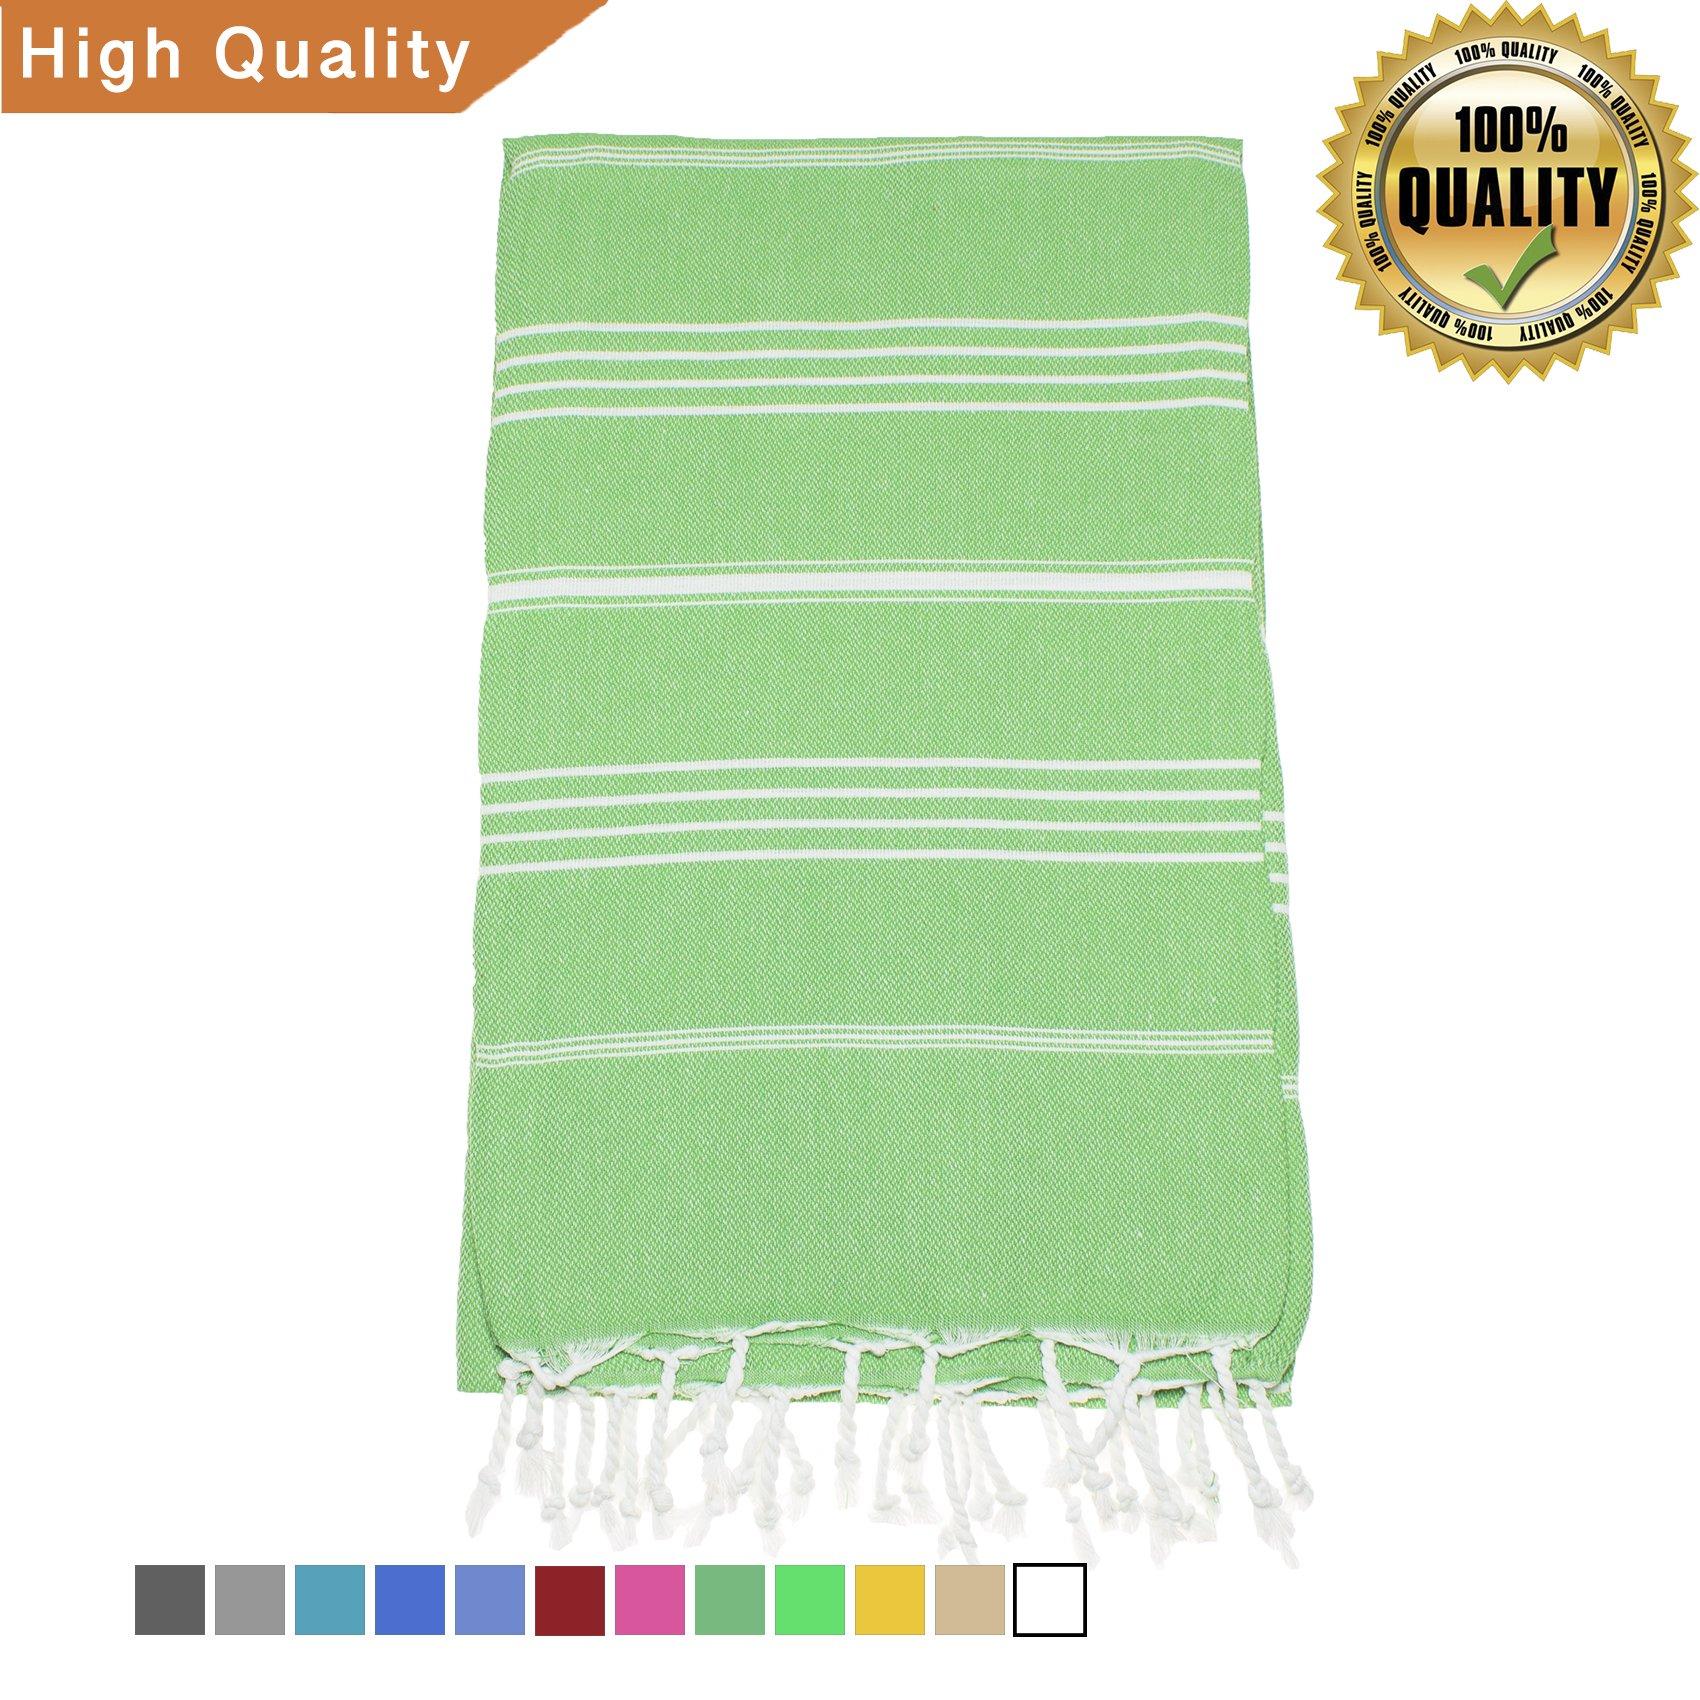 Exclusive District 100% Cotton Turkish Towel/Peshtemal for Beach, Spa, Pool, Bath, Gym 38''x70'' (Paris Green)